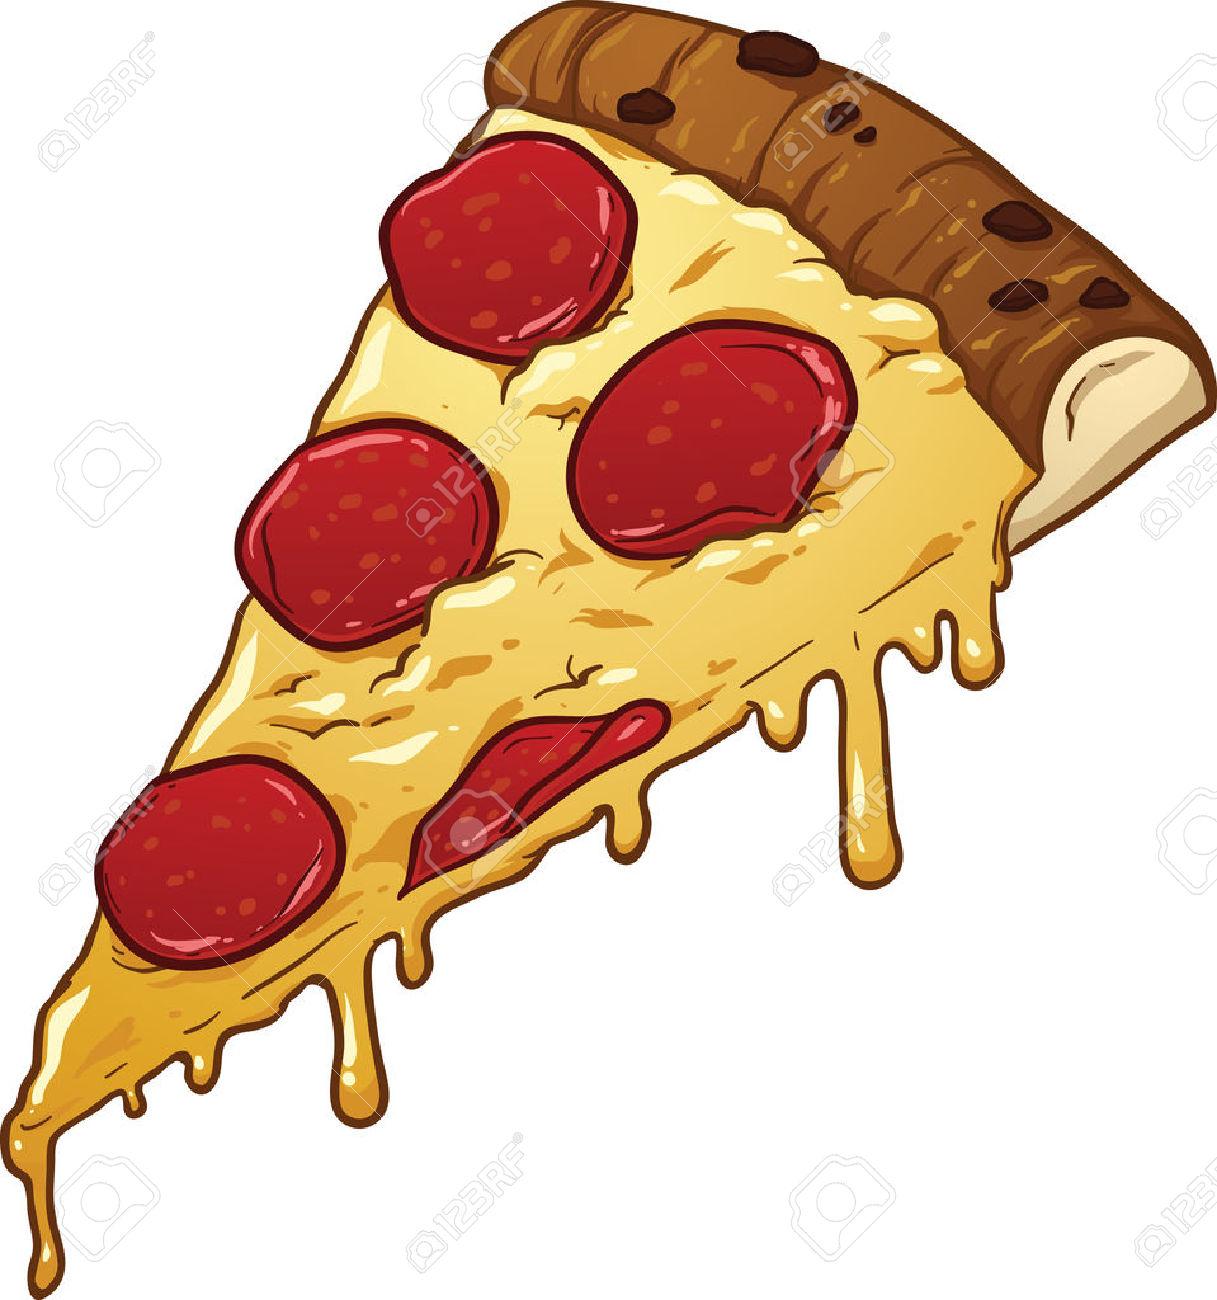 Melting pizza clipart png transparent 70+ Pepperoni Pizza Clipart | ClipartLook png transparent